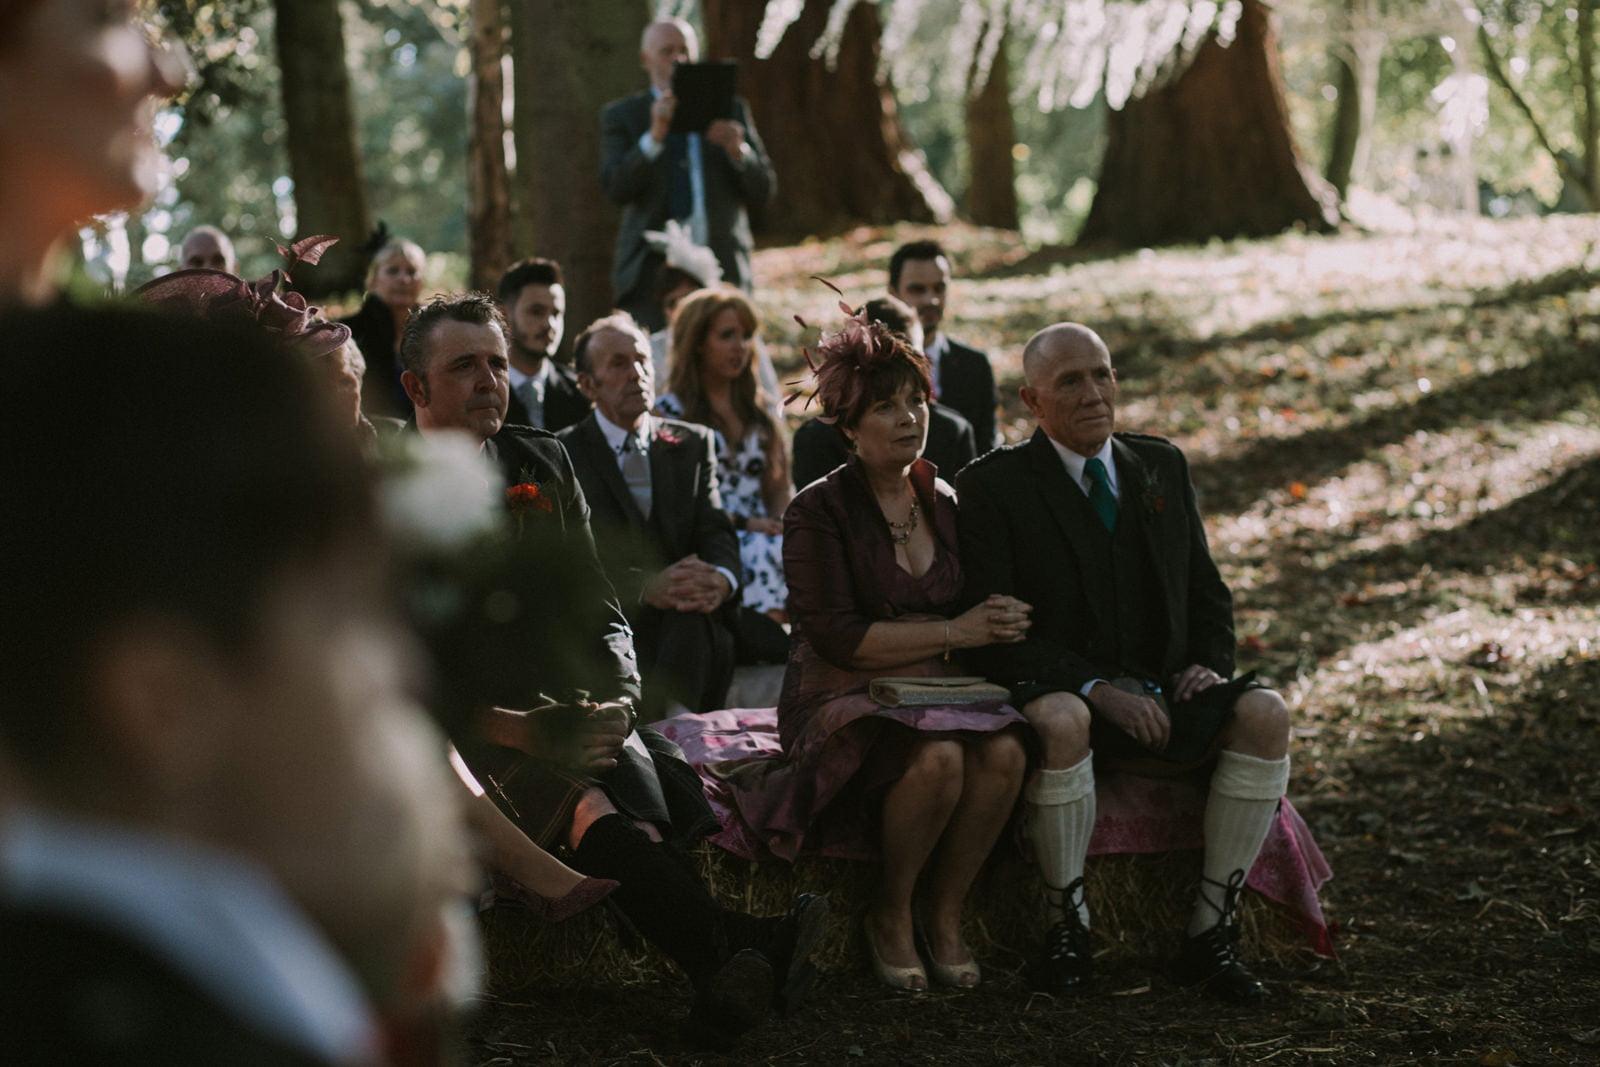 cupar wedding photograhy